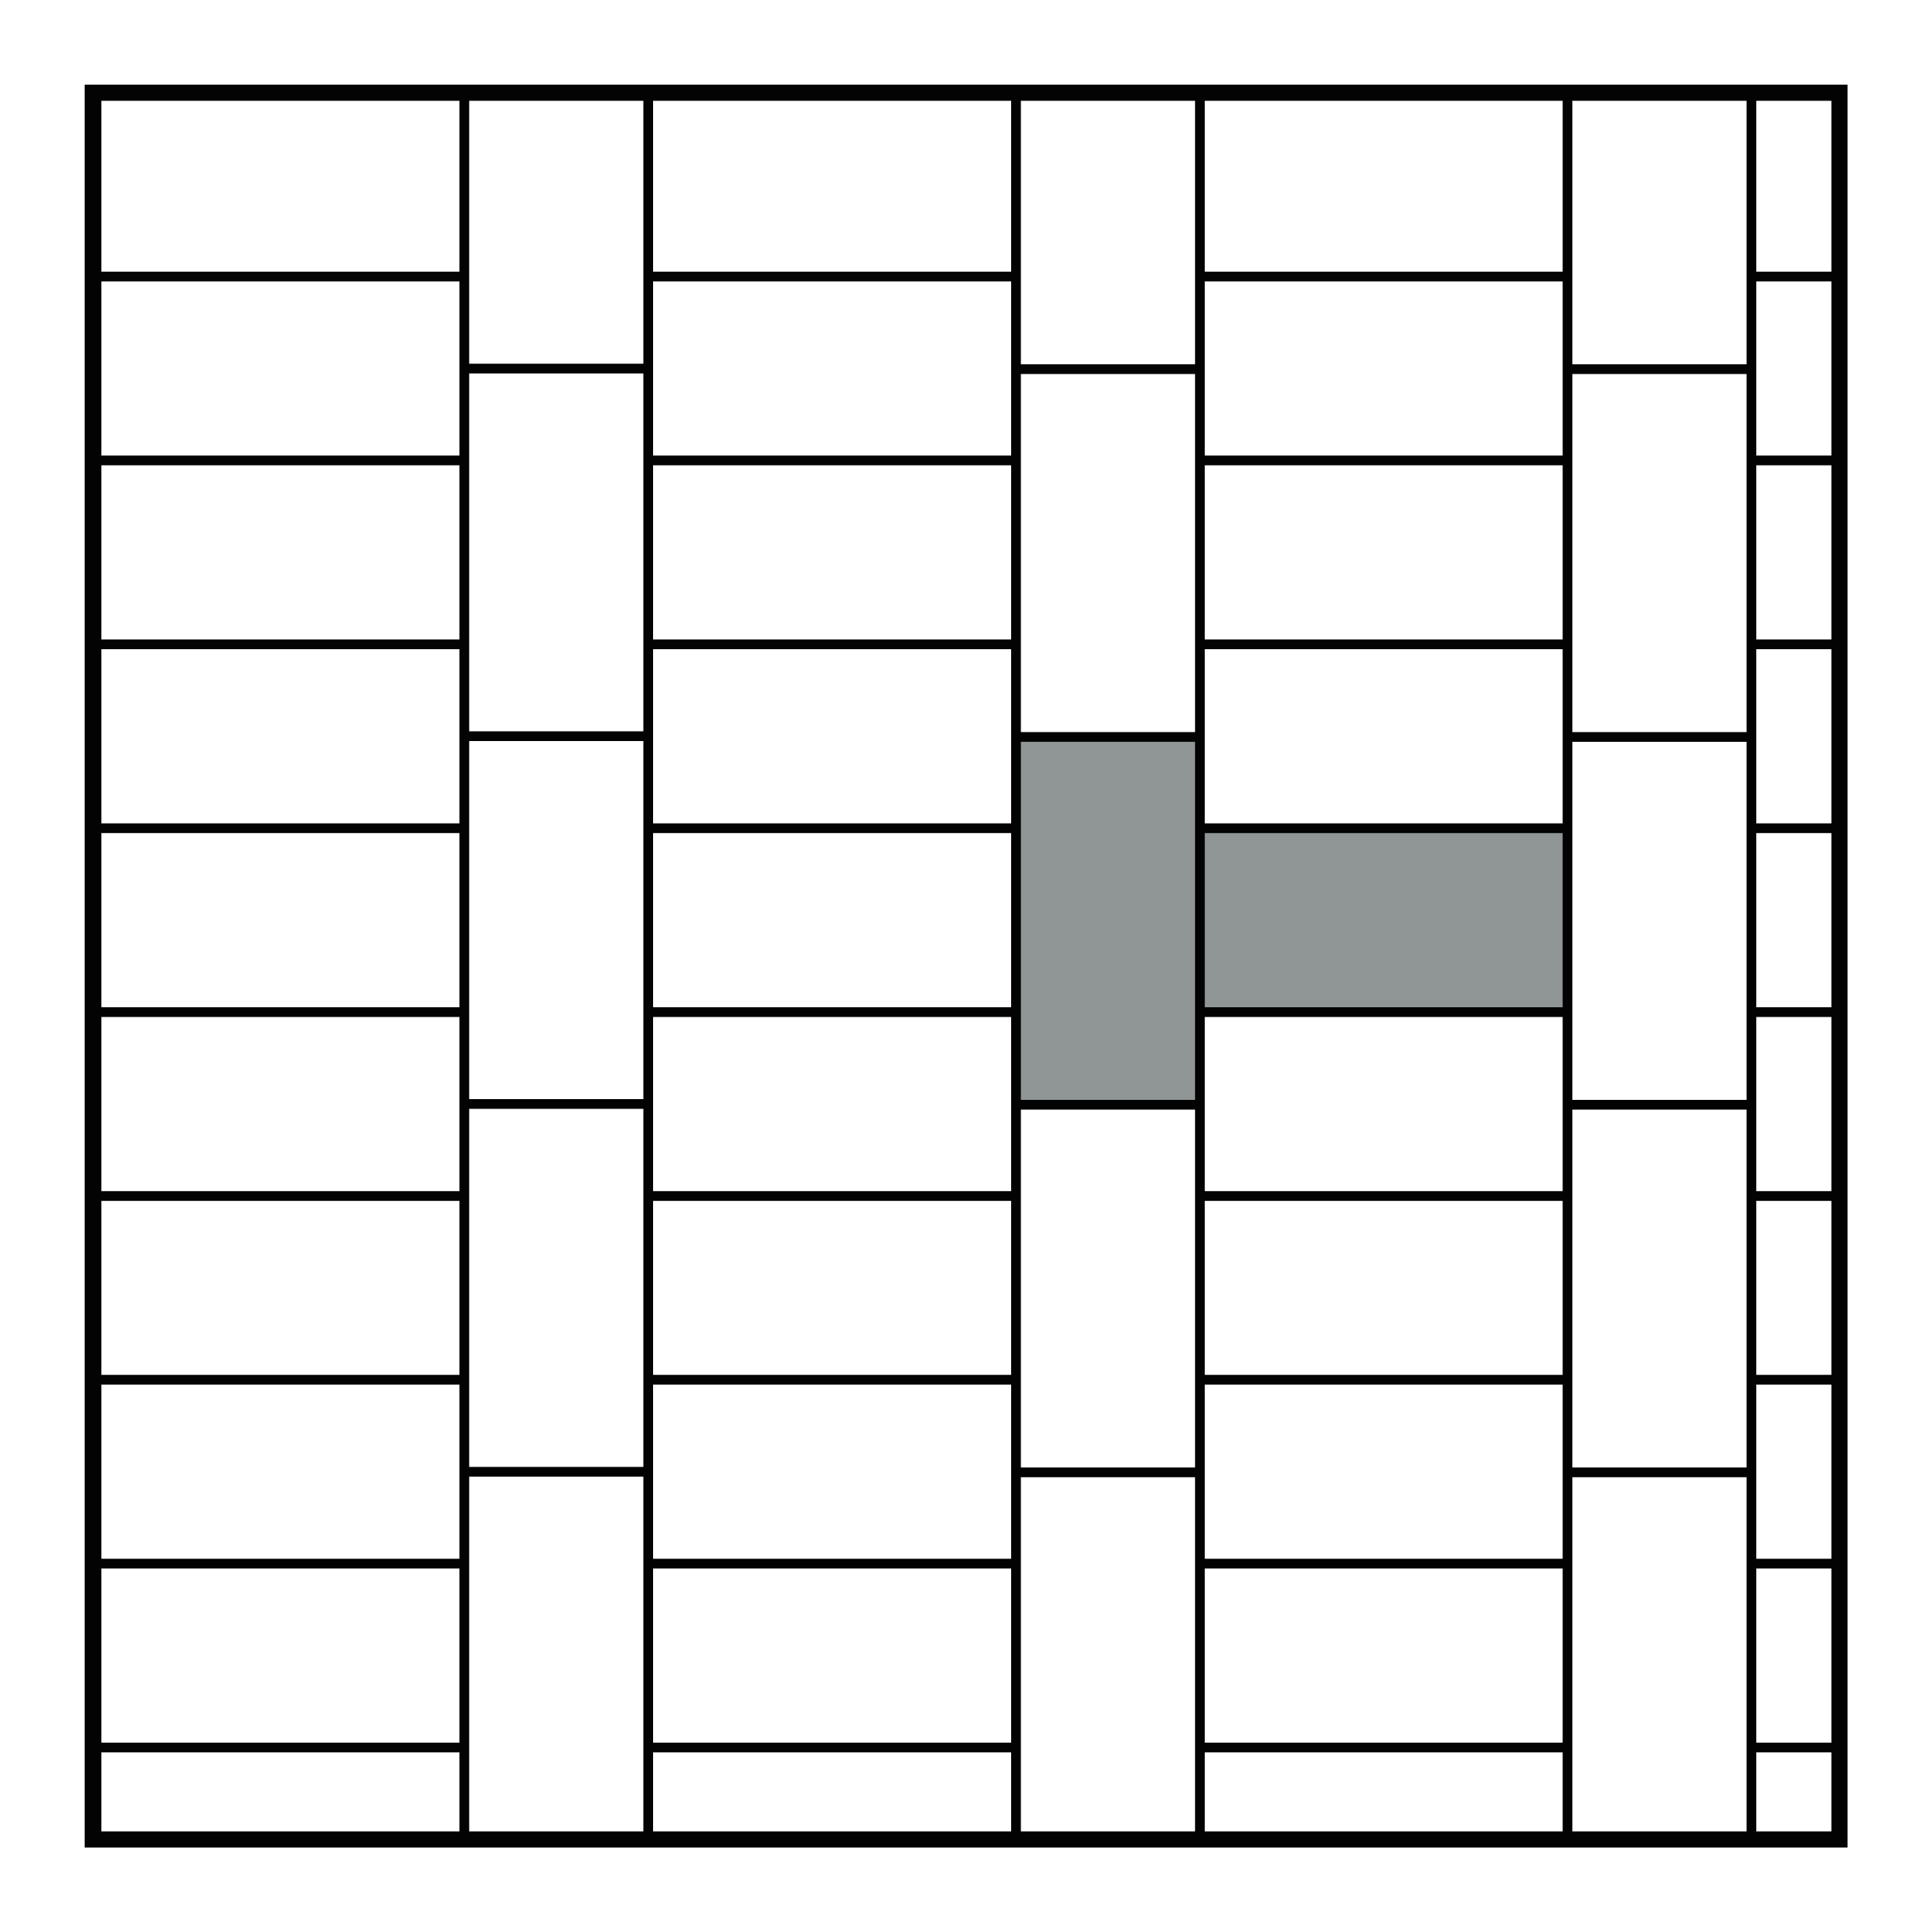 CORRIDOR - HORIZONTAL